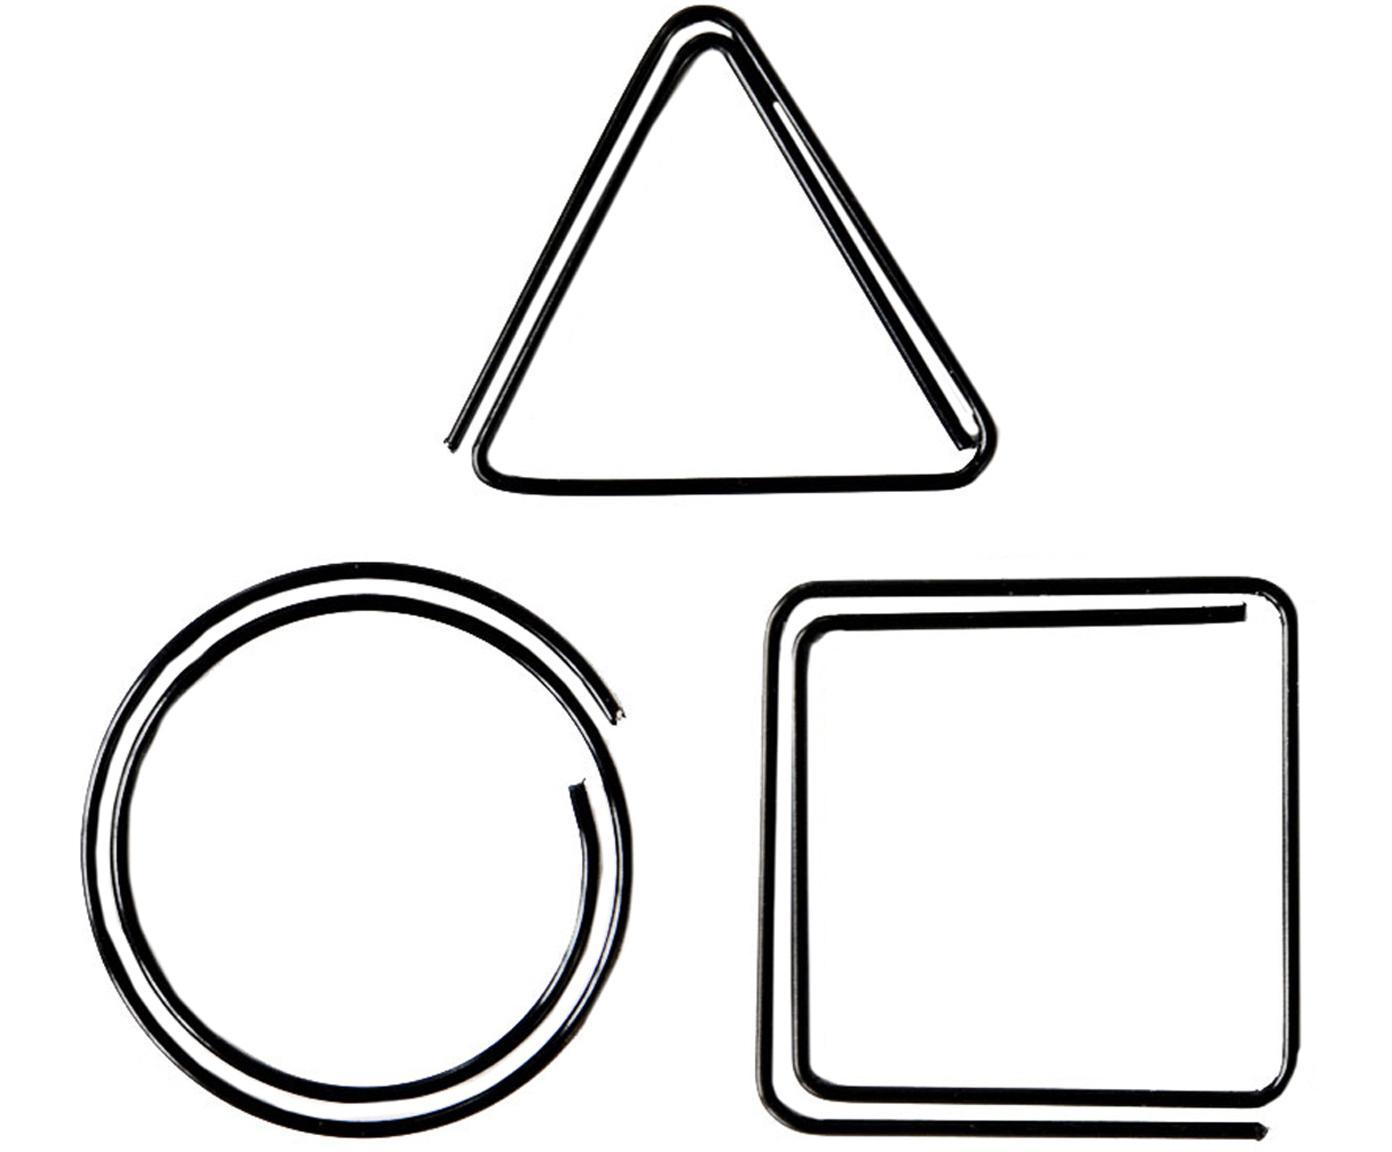 Büroklammern-Set Geometria, 9-tlg., Metall, lackiert, Schwarz, 3 x 3 cm